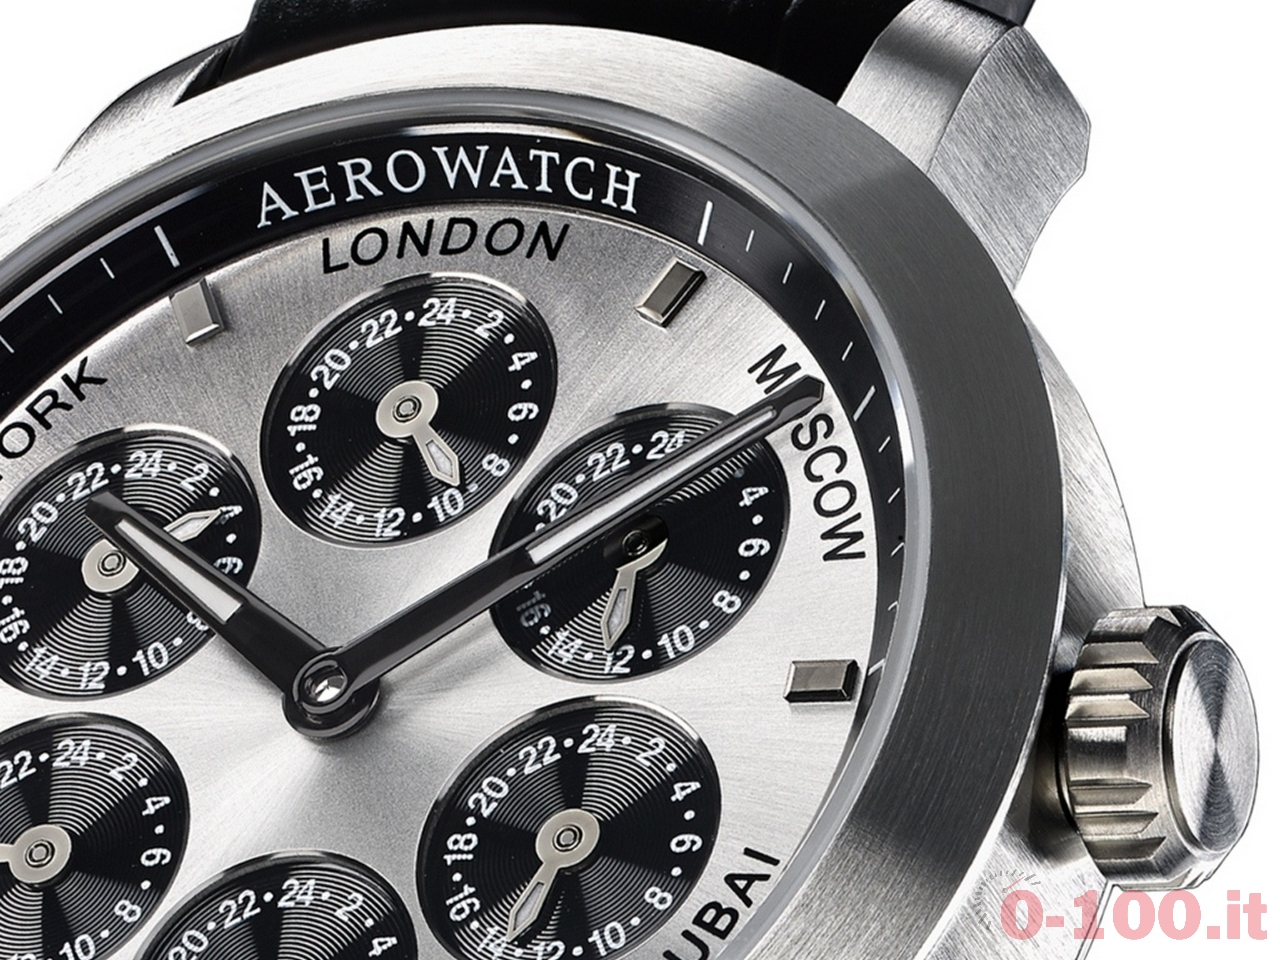 anteprima-baselworld-2016-aerowatch-renaissance-7-time-zones-prezzo-price_0-1002